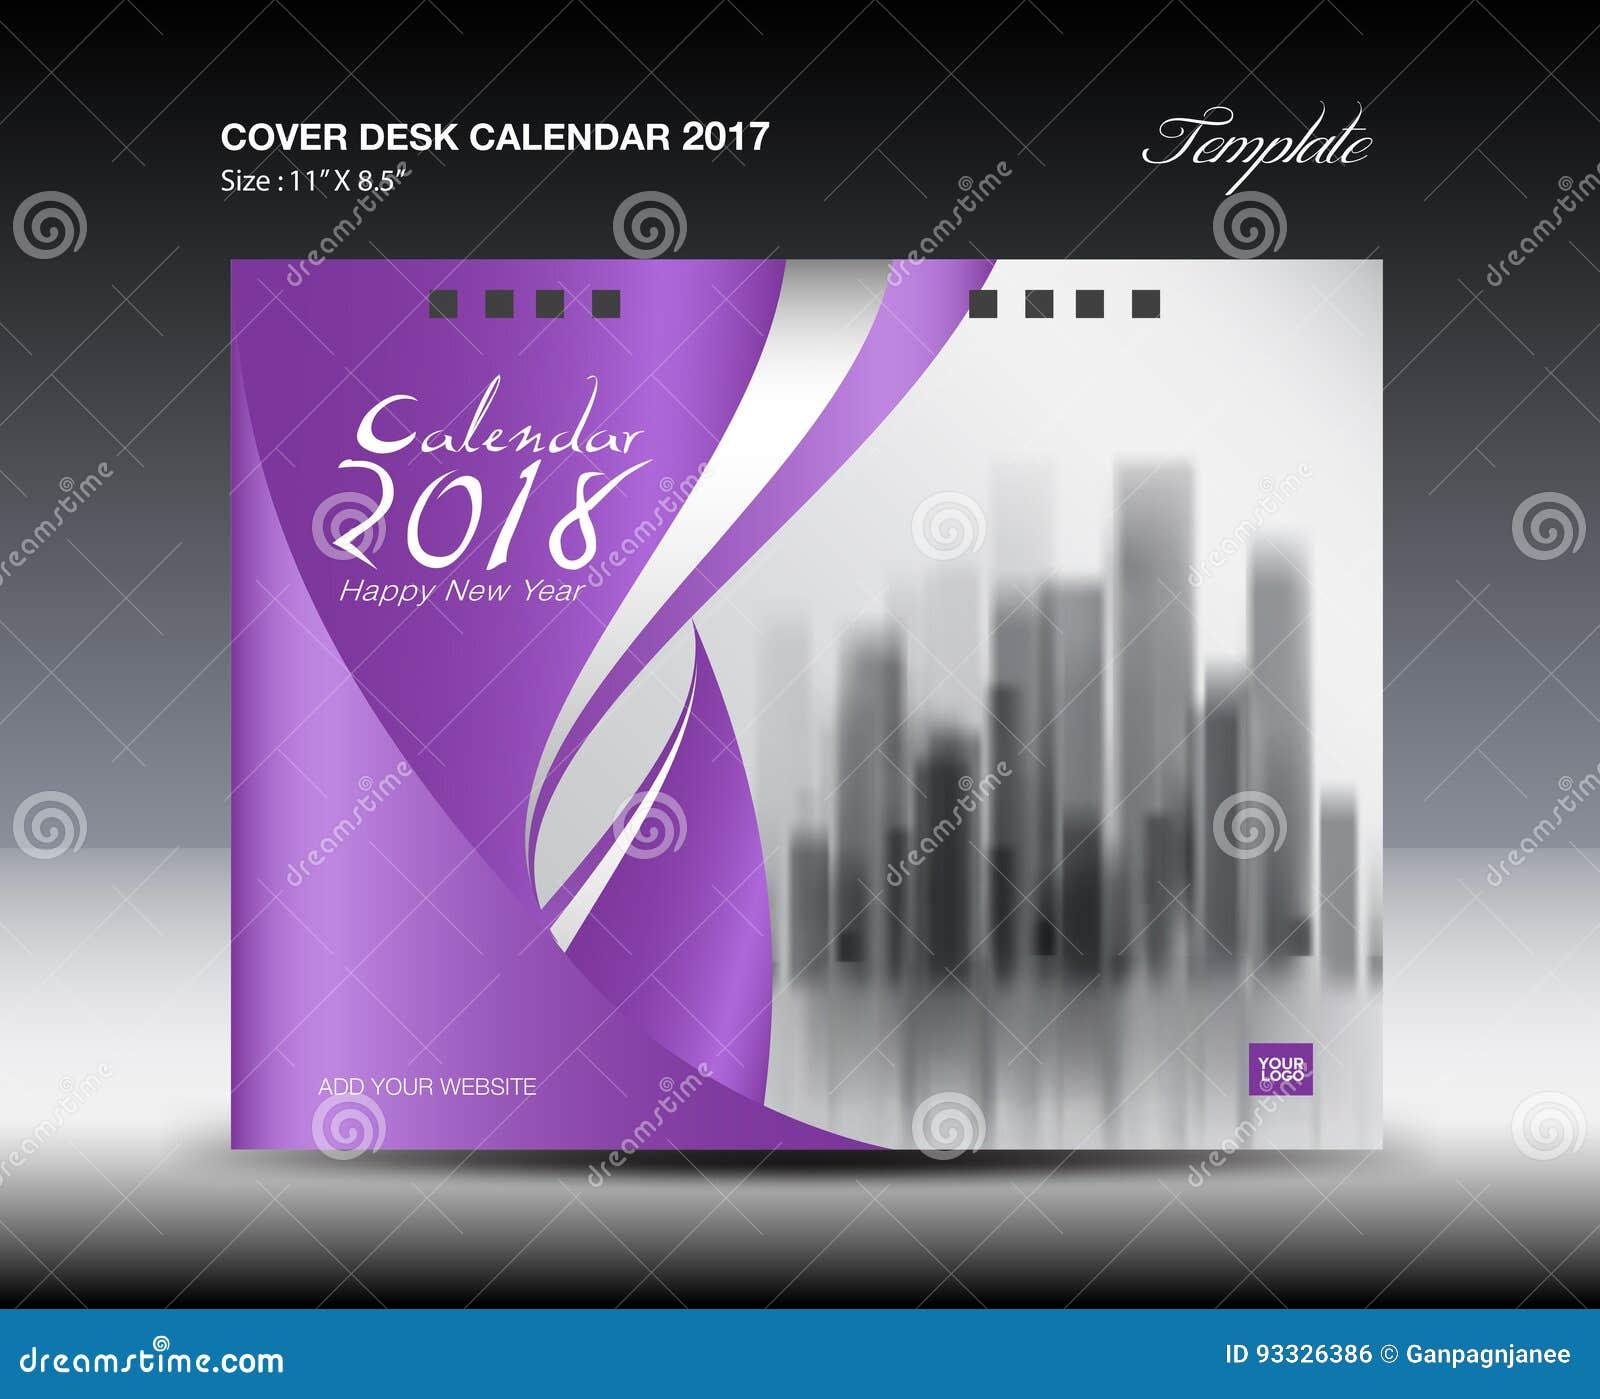 Cover Calendar Design Vector : Purple cover desk calendar design flyer template